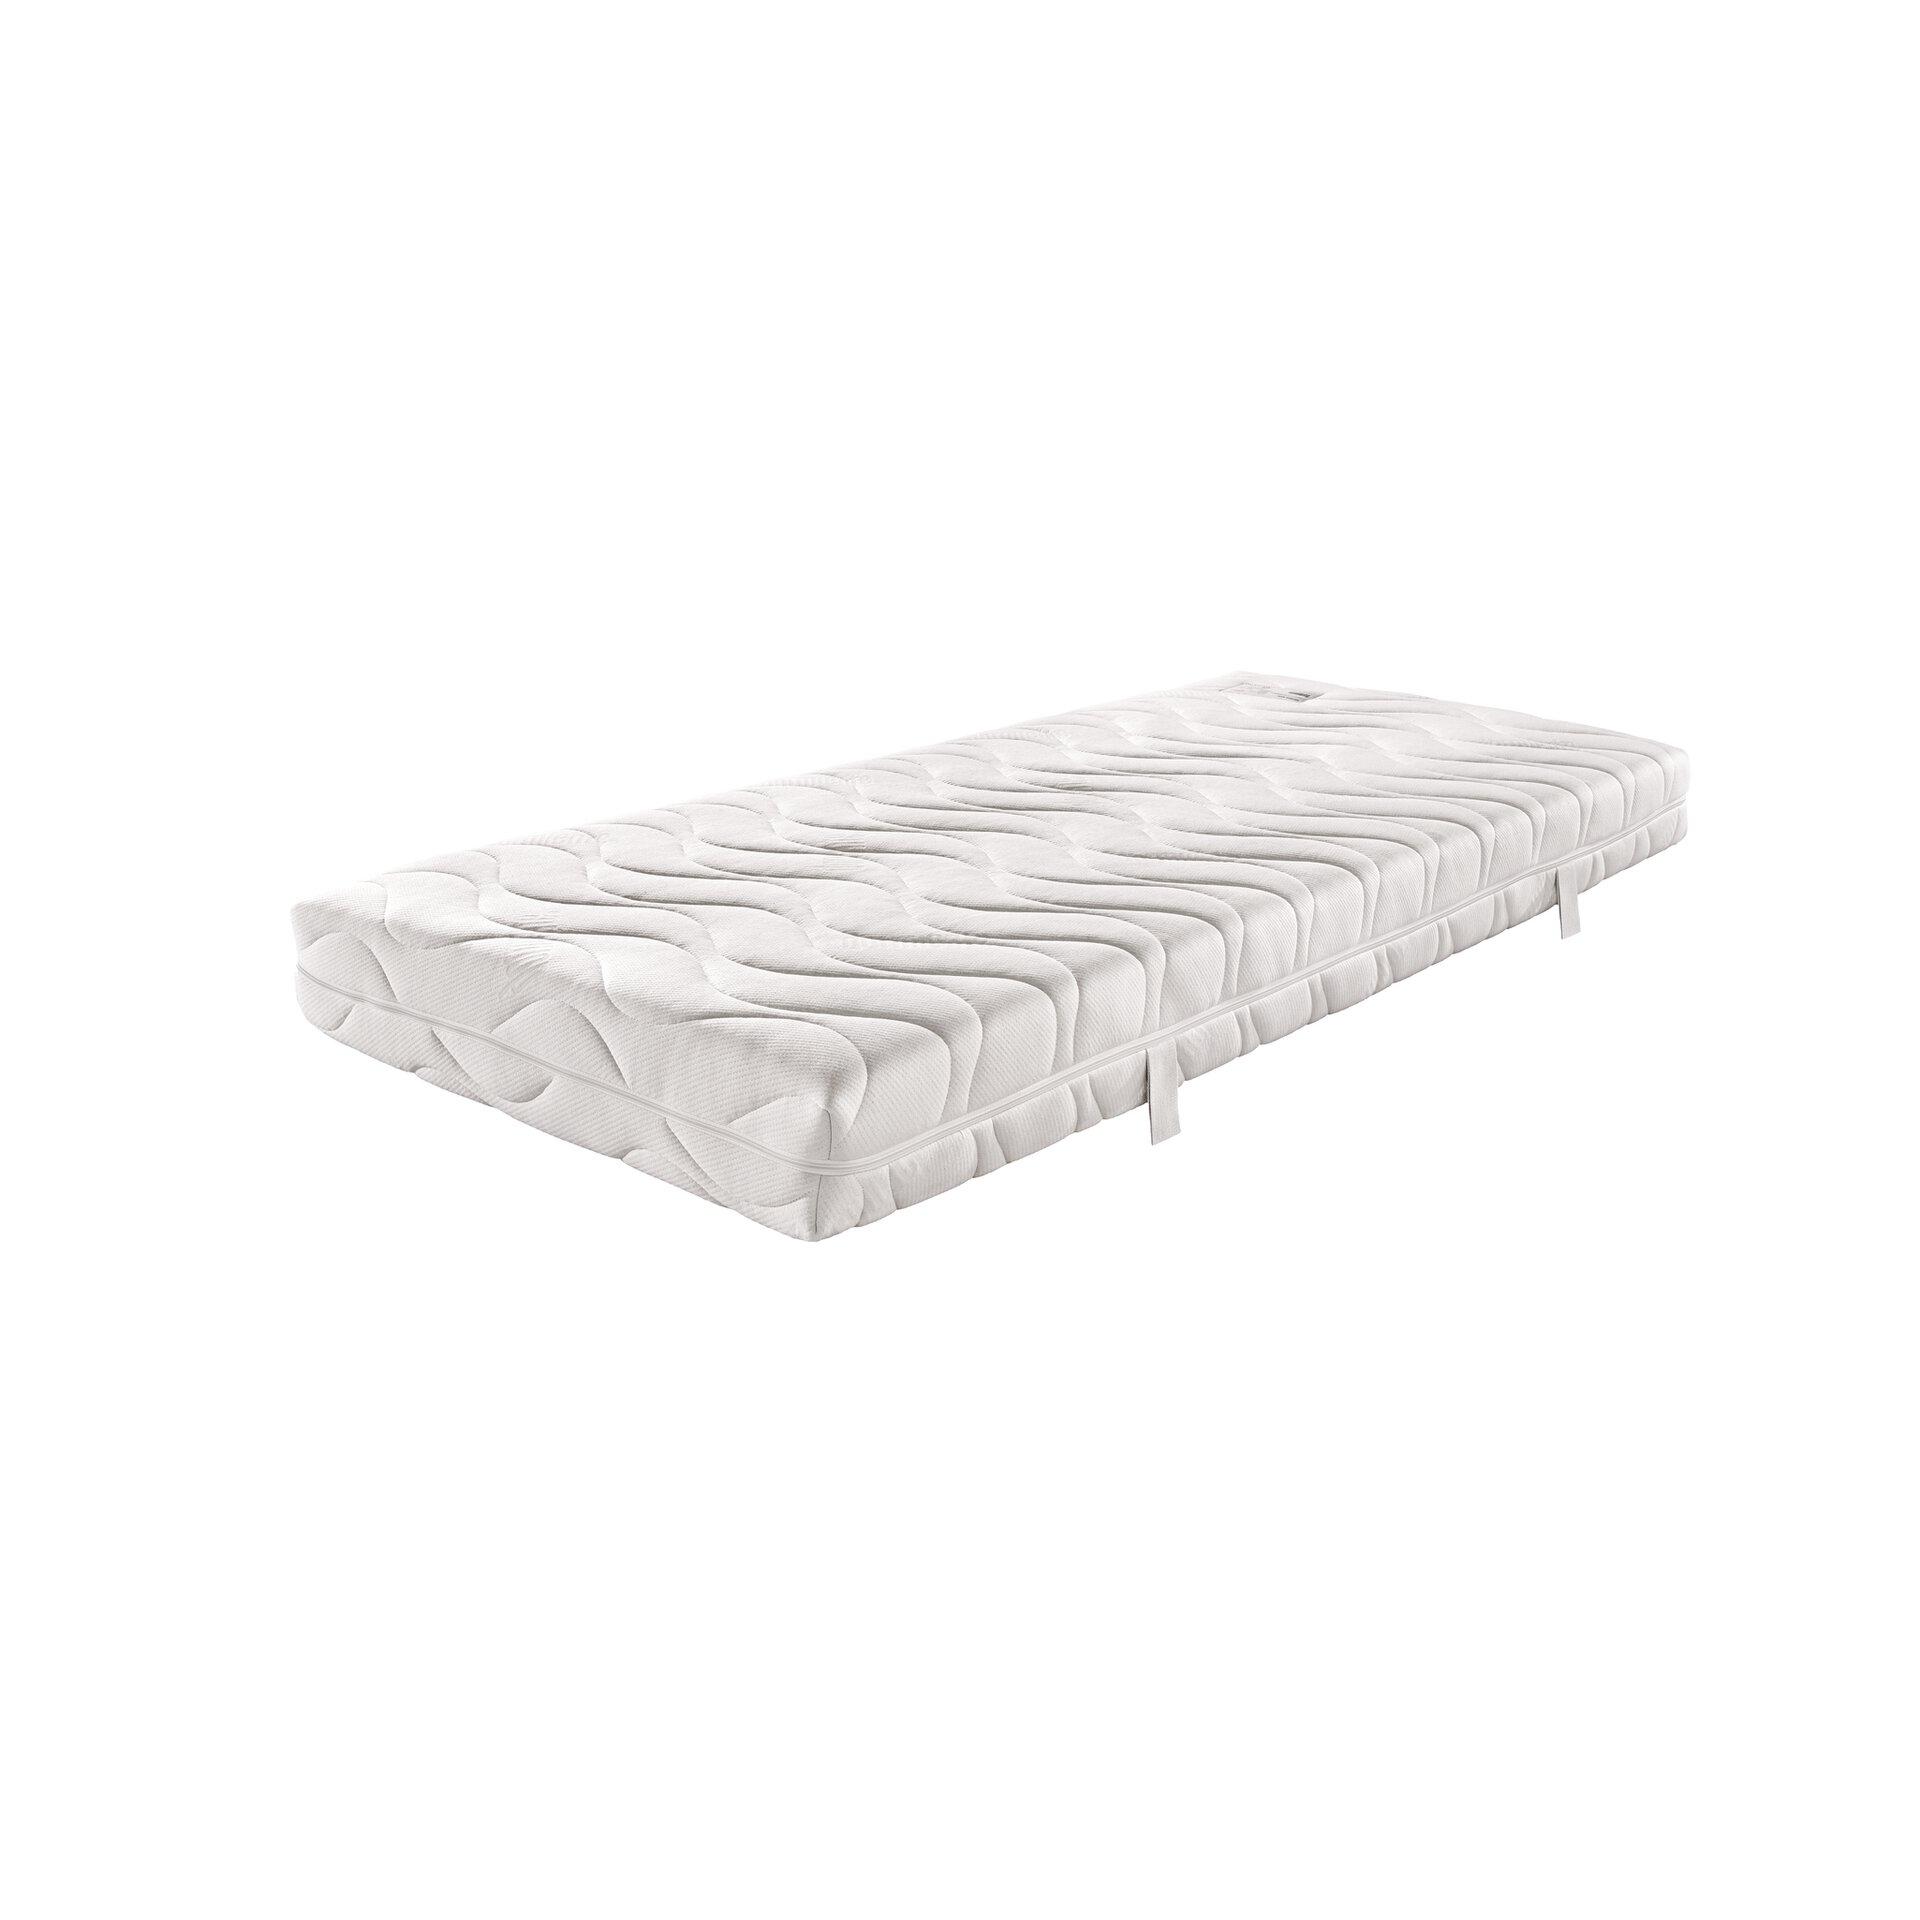 Matratze OPAL PLUS VALMONDO Textil weiß 90 x 14 x 200 cm